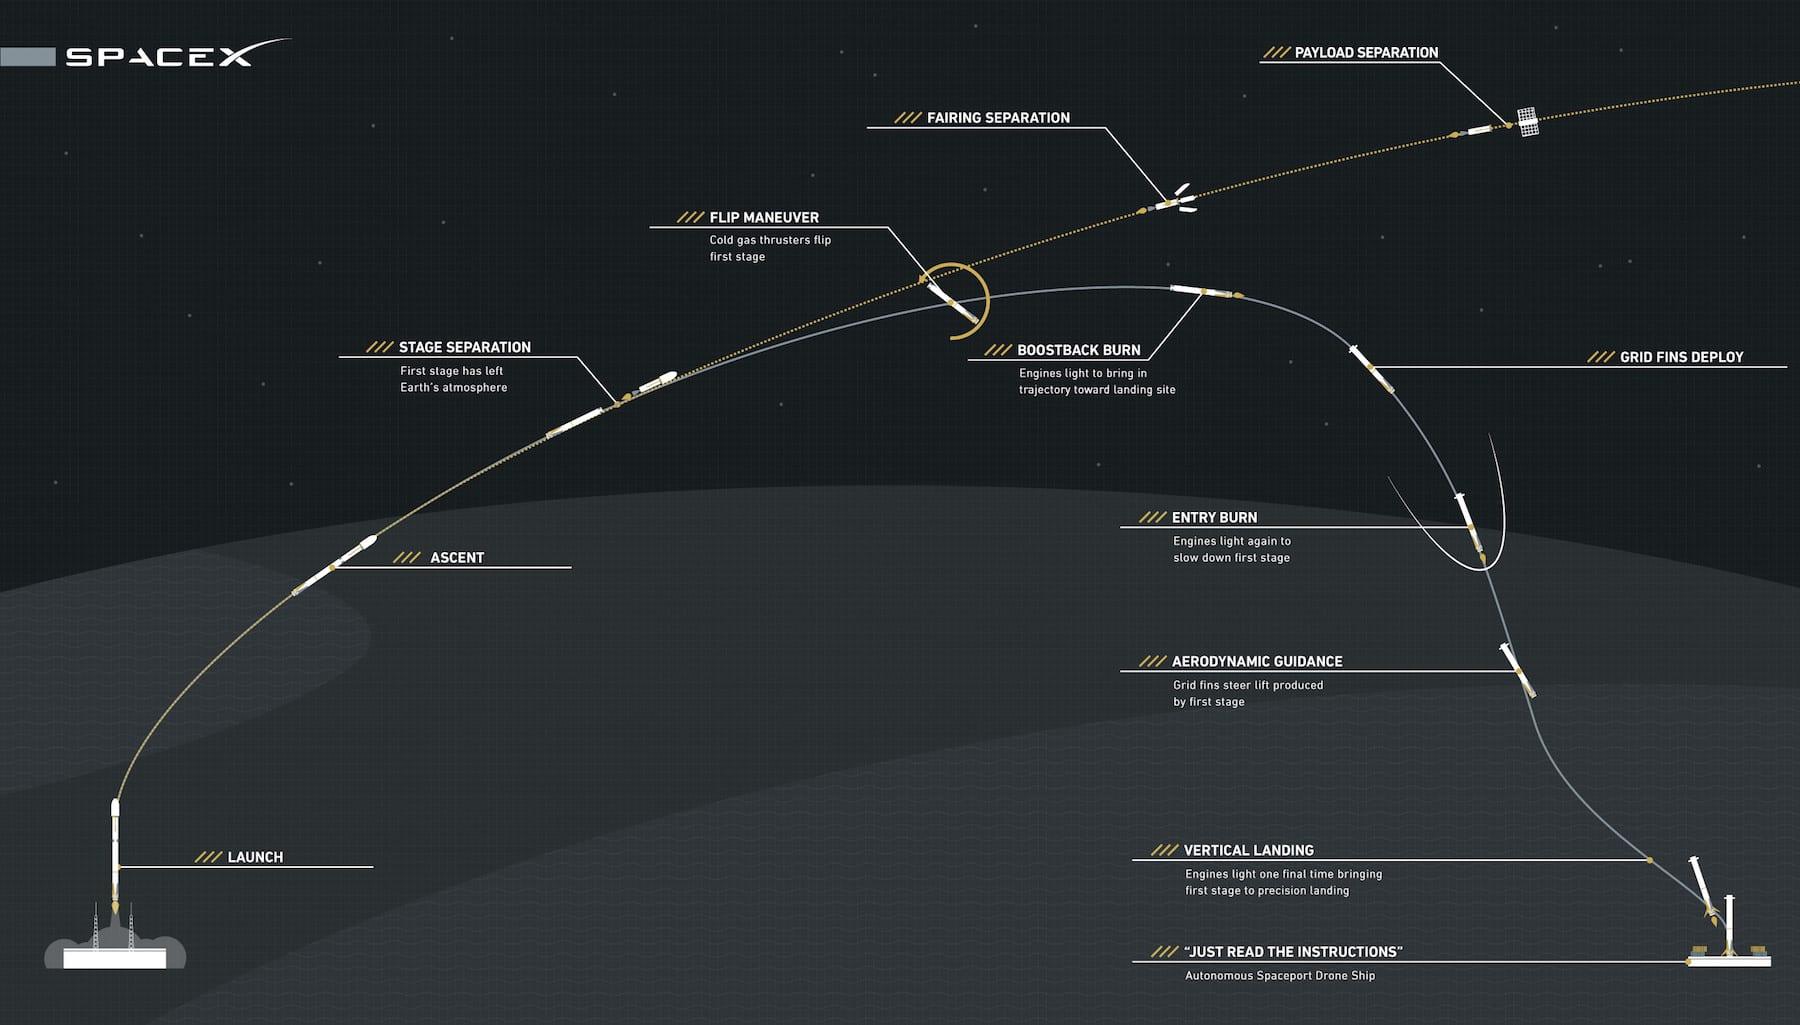 spacex flacon 9 atterrissage mer plateforme drone 8 avril 2016 dragon capsule décollage trajectoire schéma